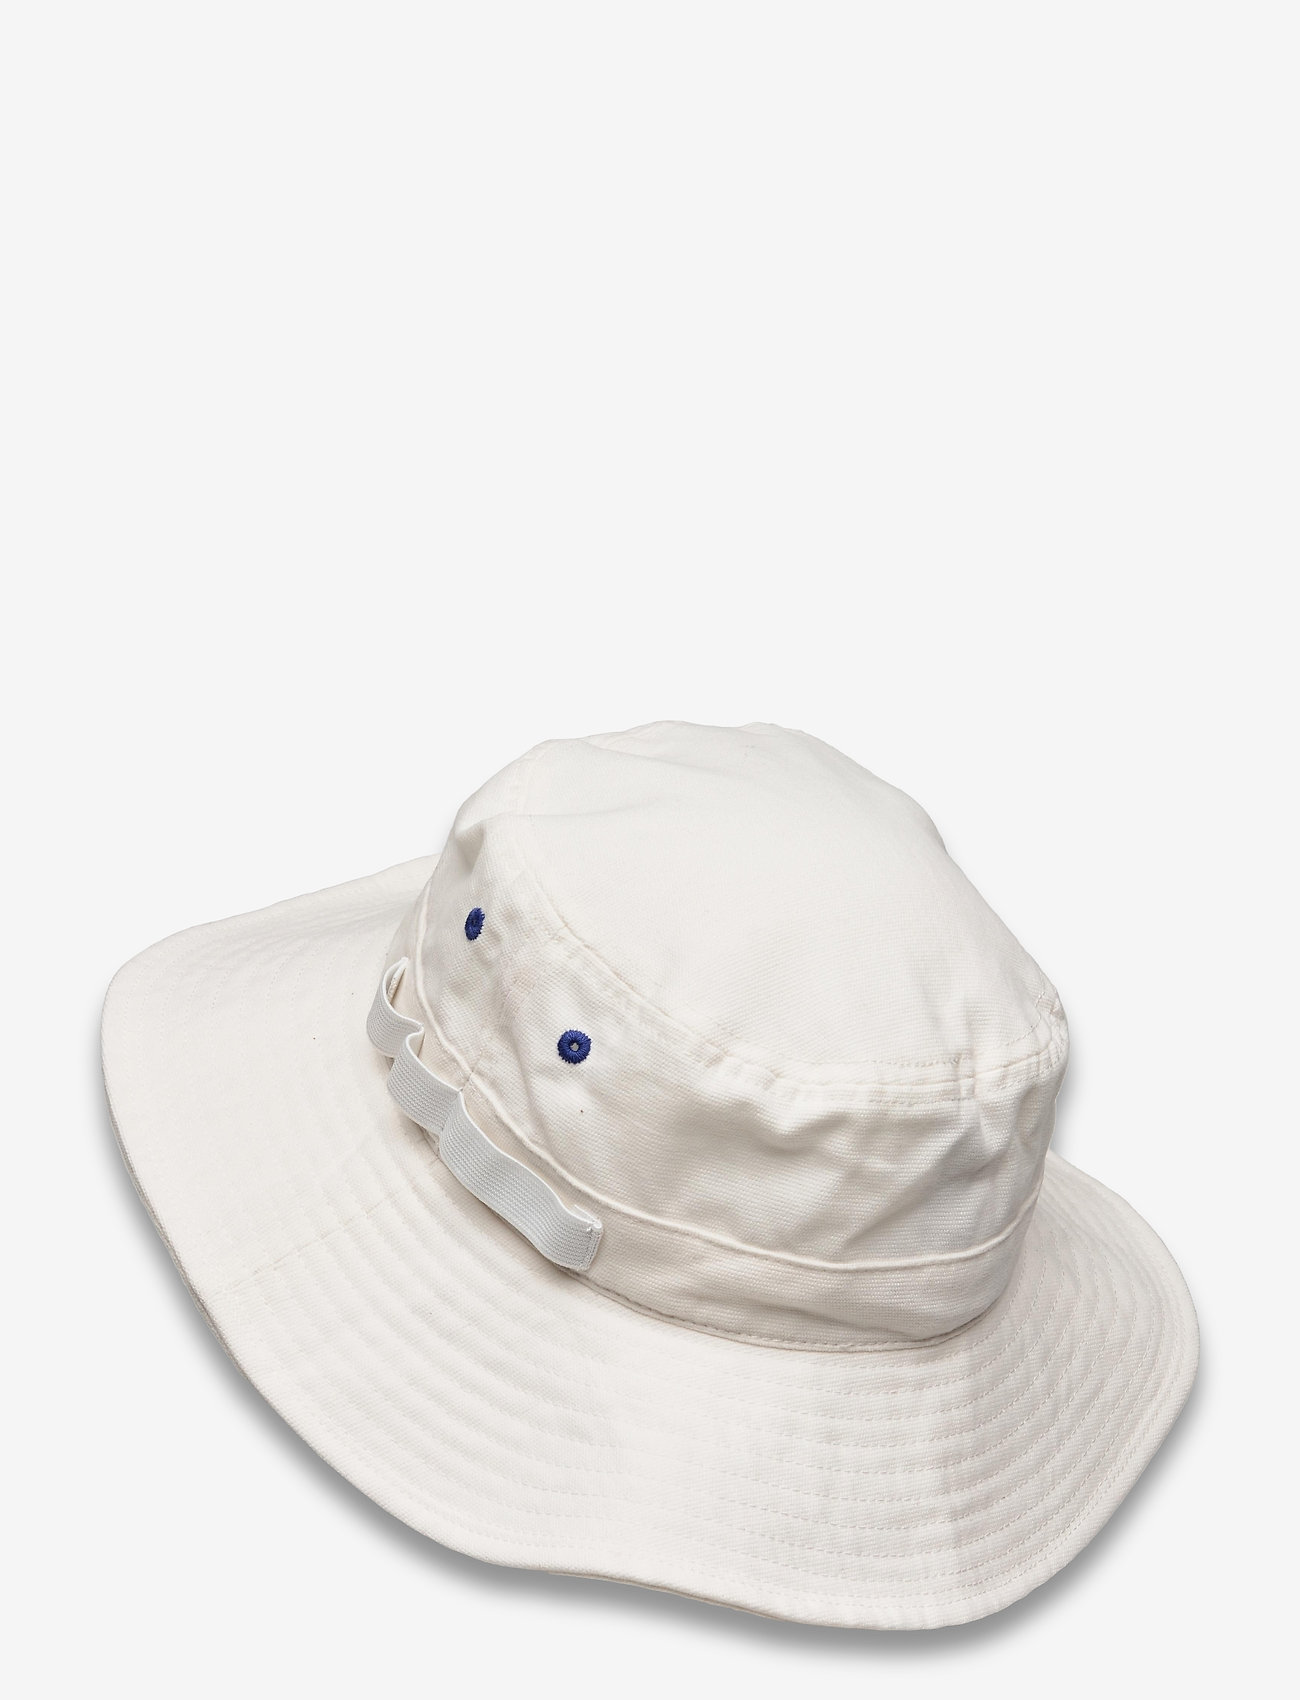 Kangol - KG UTILITY CORDS JUNGLE HAT - off white - 1